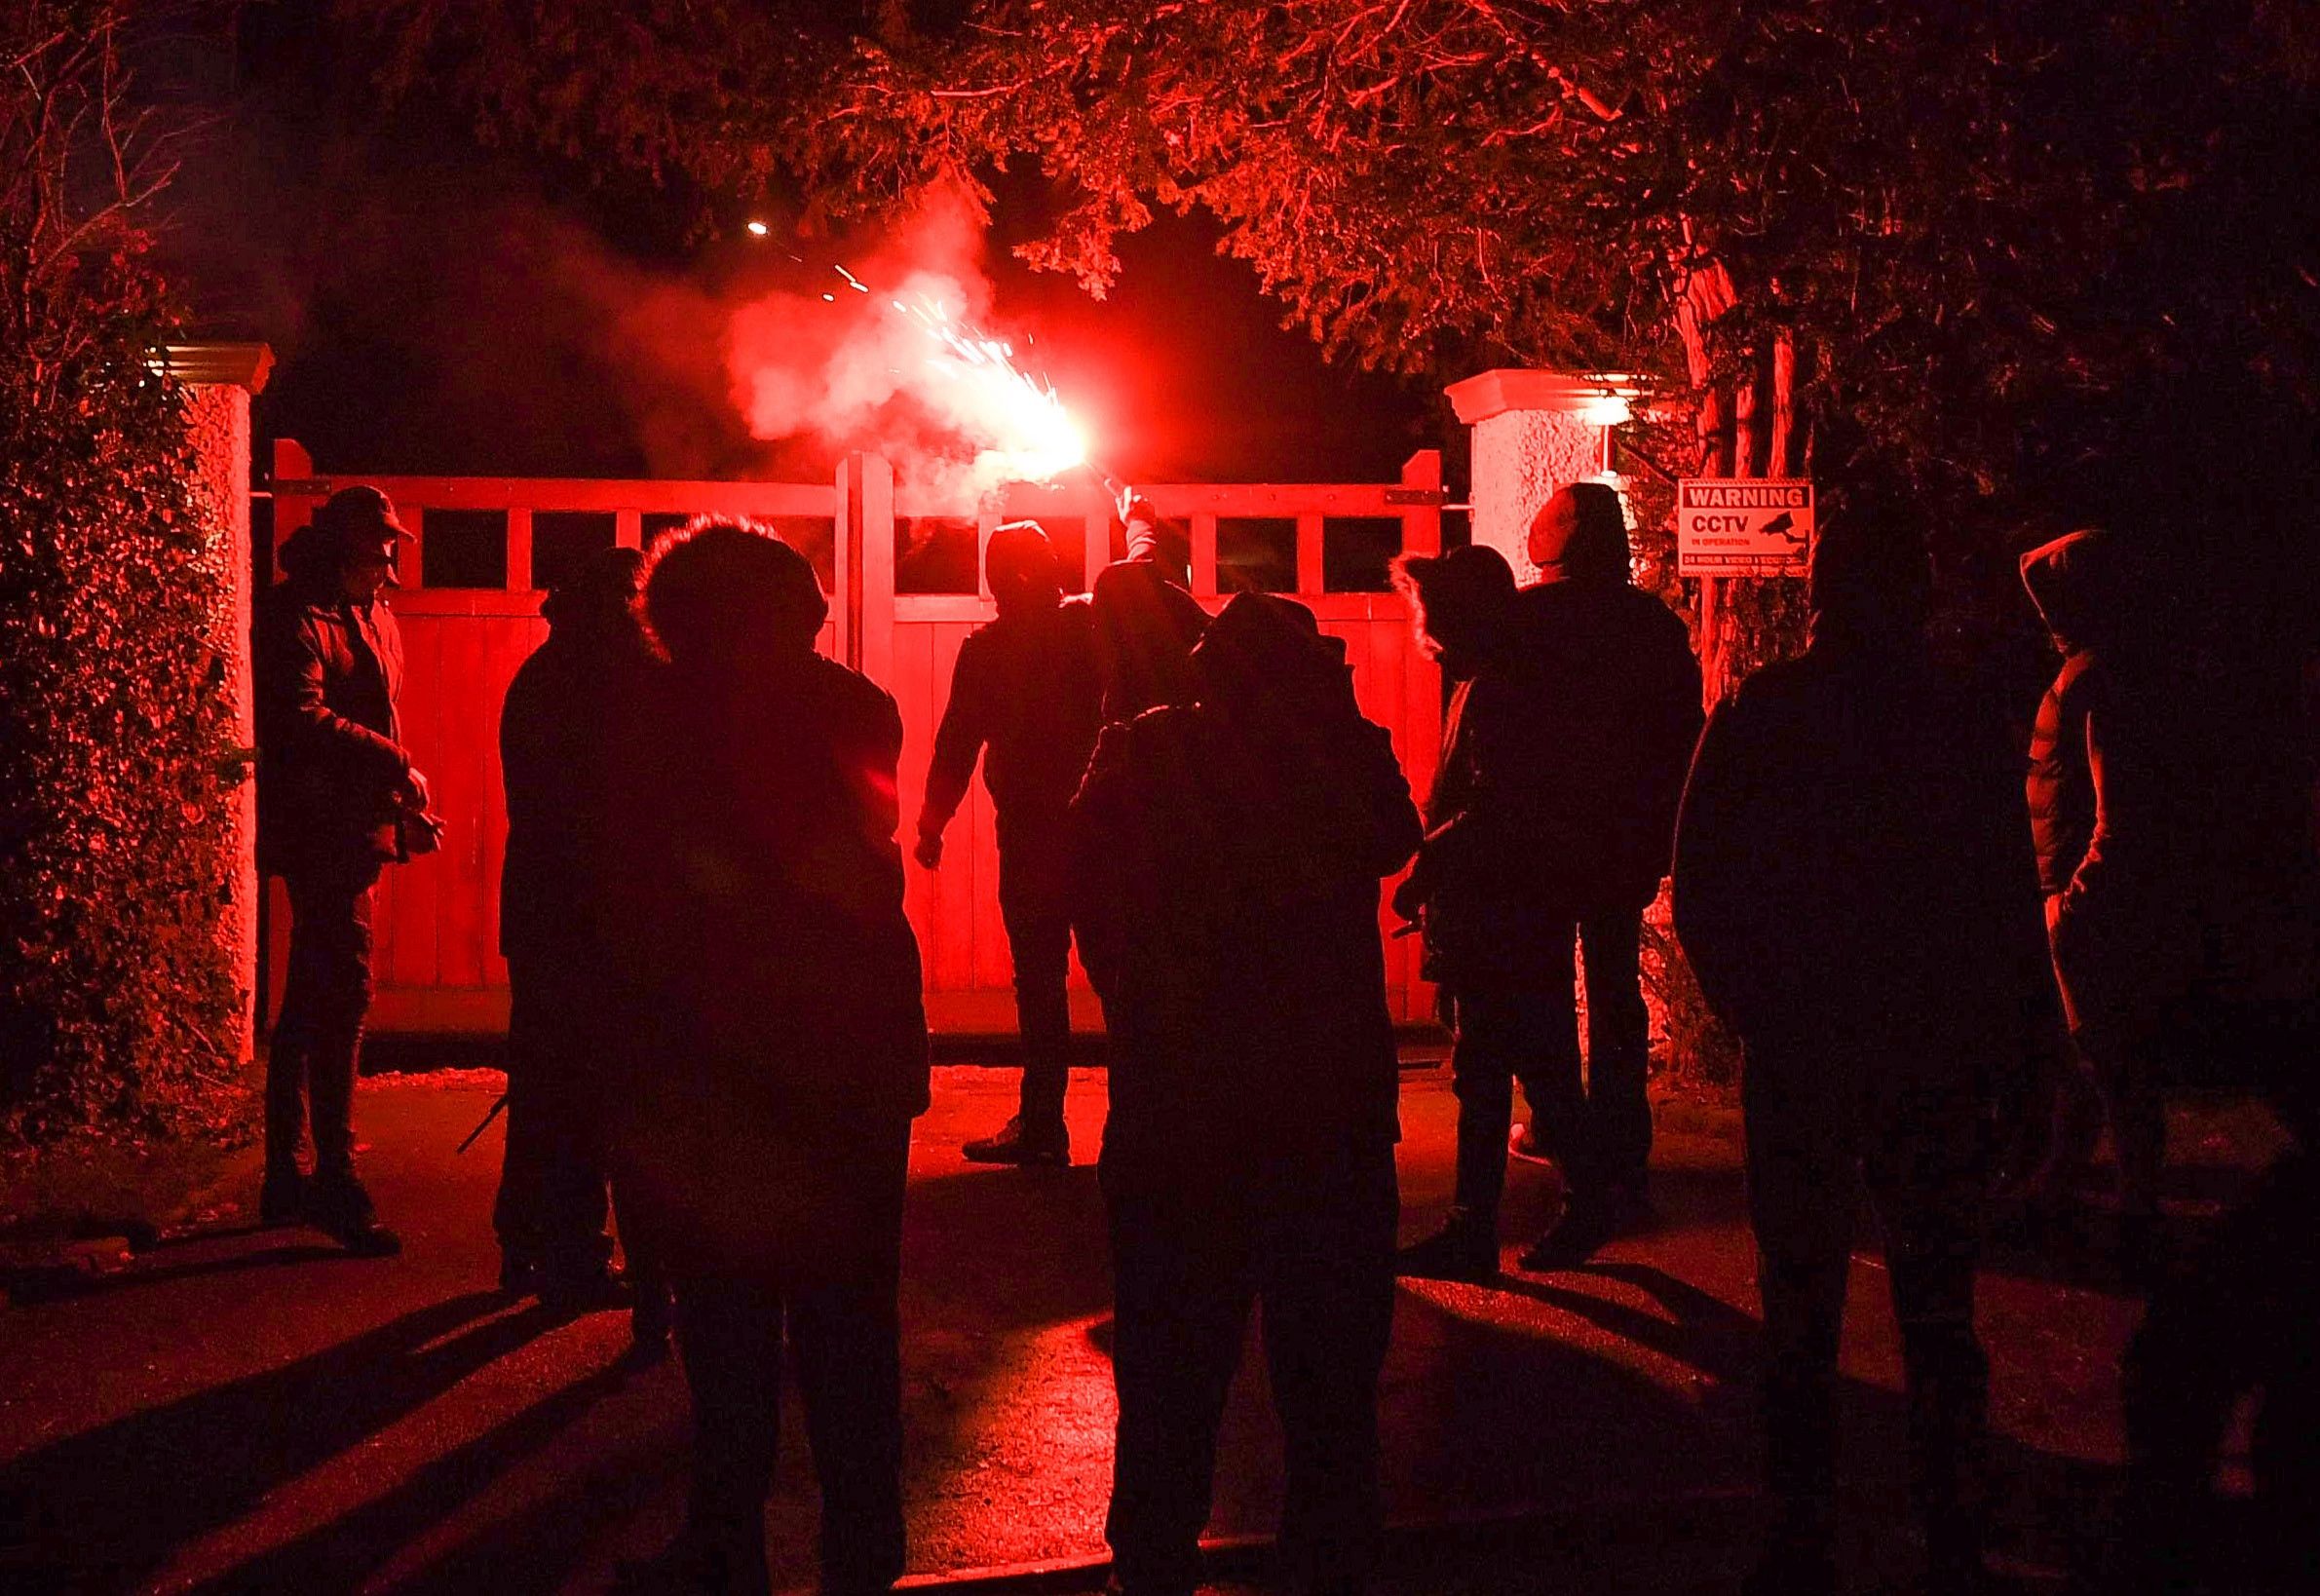 Фанати Манчестер Юнайтед напали на будинок директора клубу